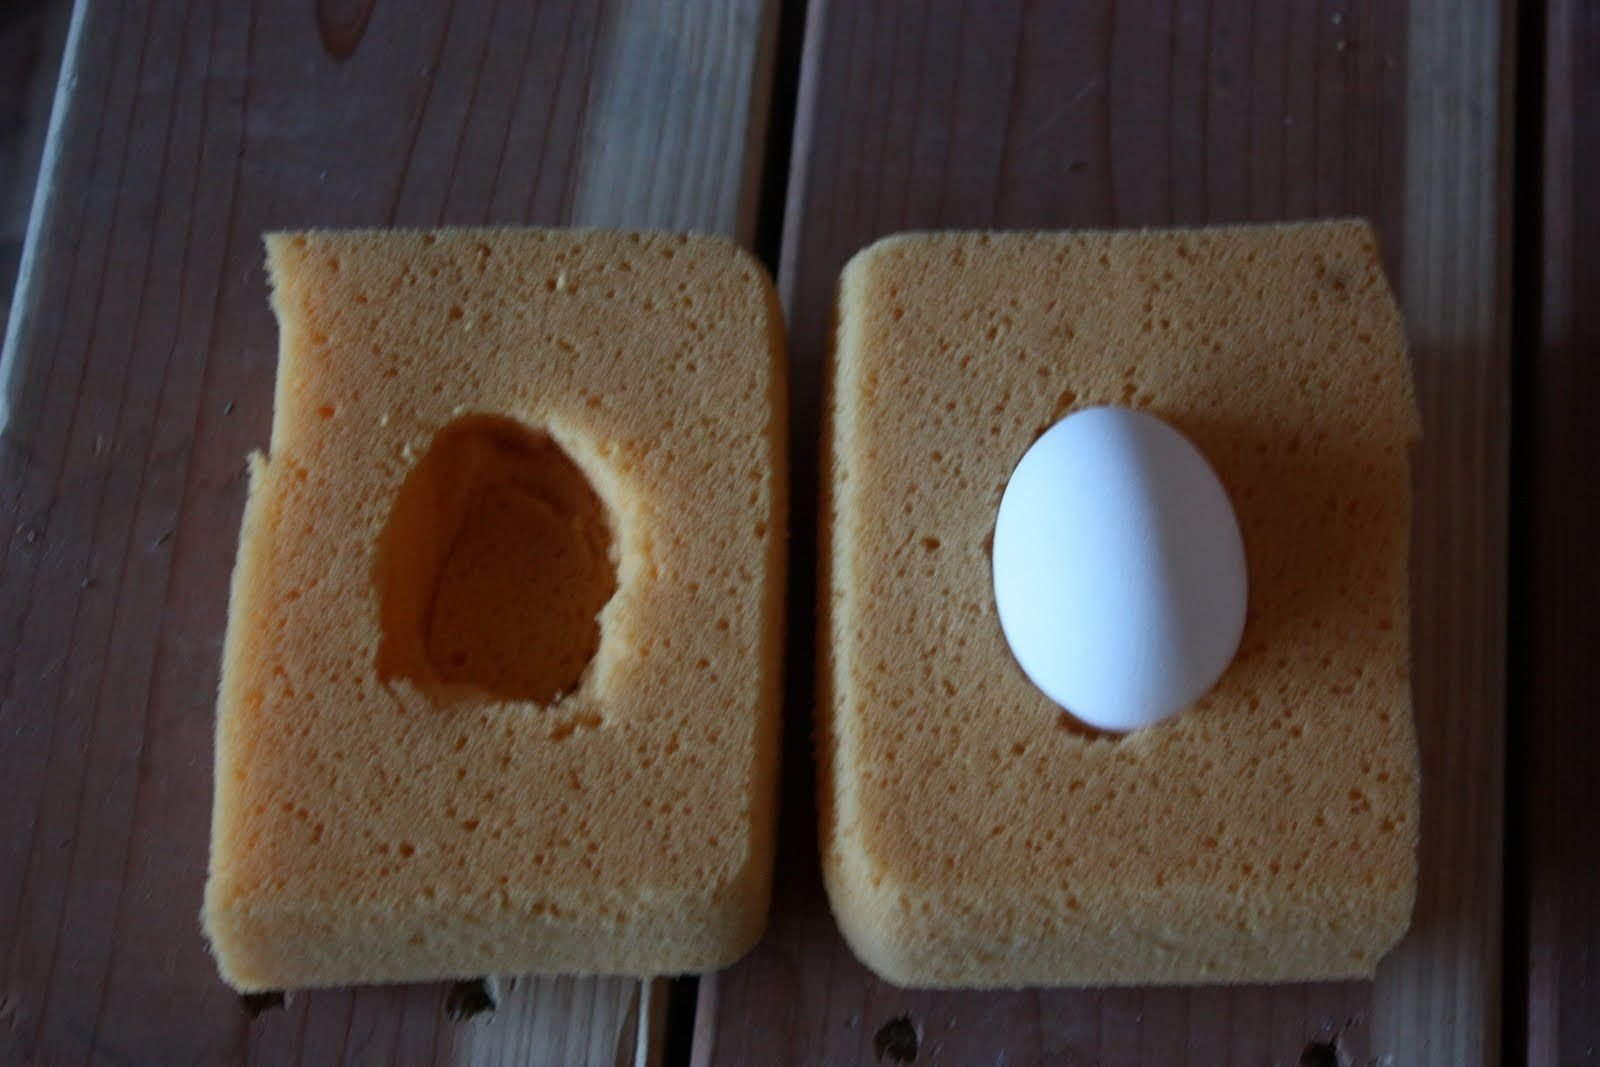 10 Great Egg Drop Ideas For Kids egg drop designs google search crafts pinterest egg drop 5 2021